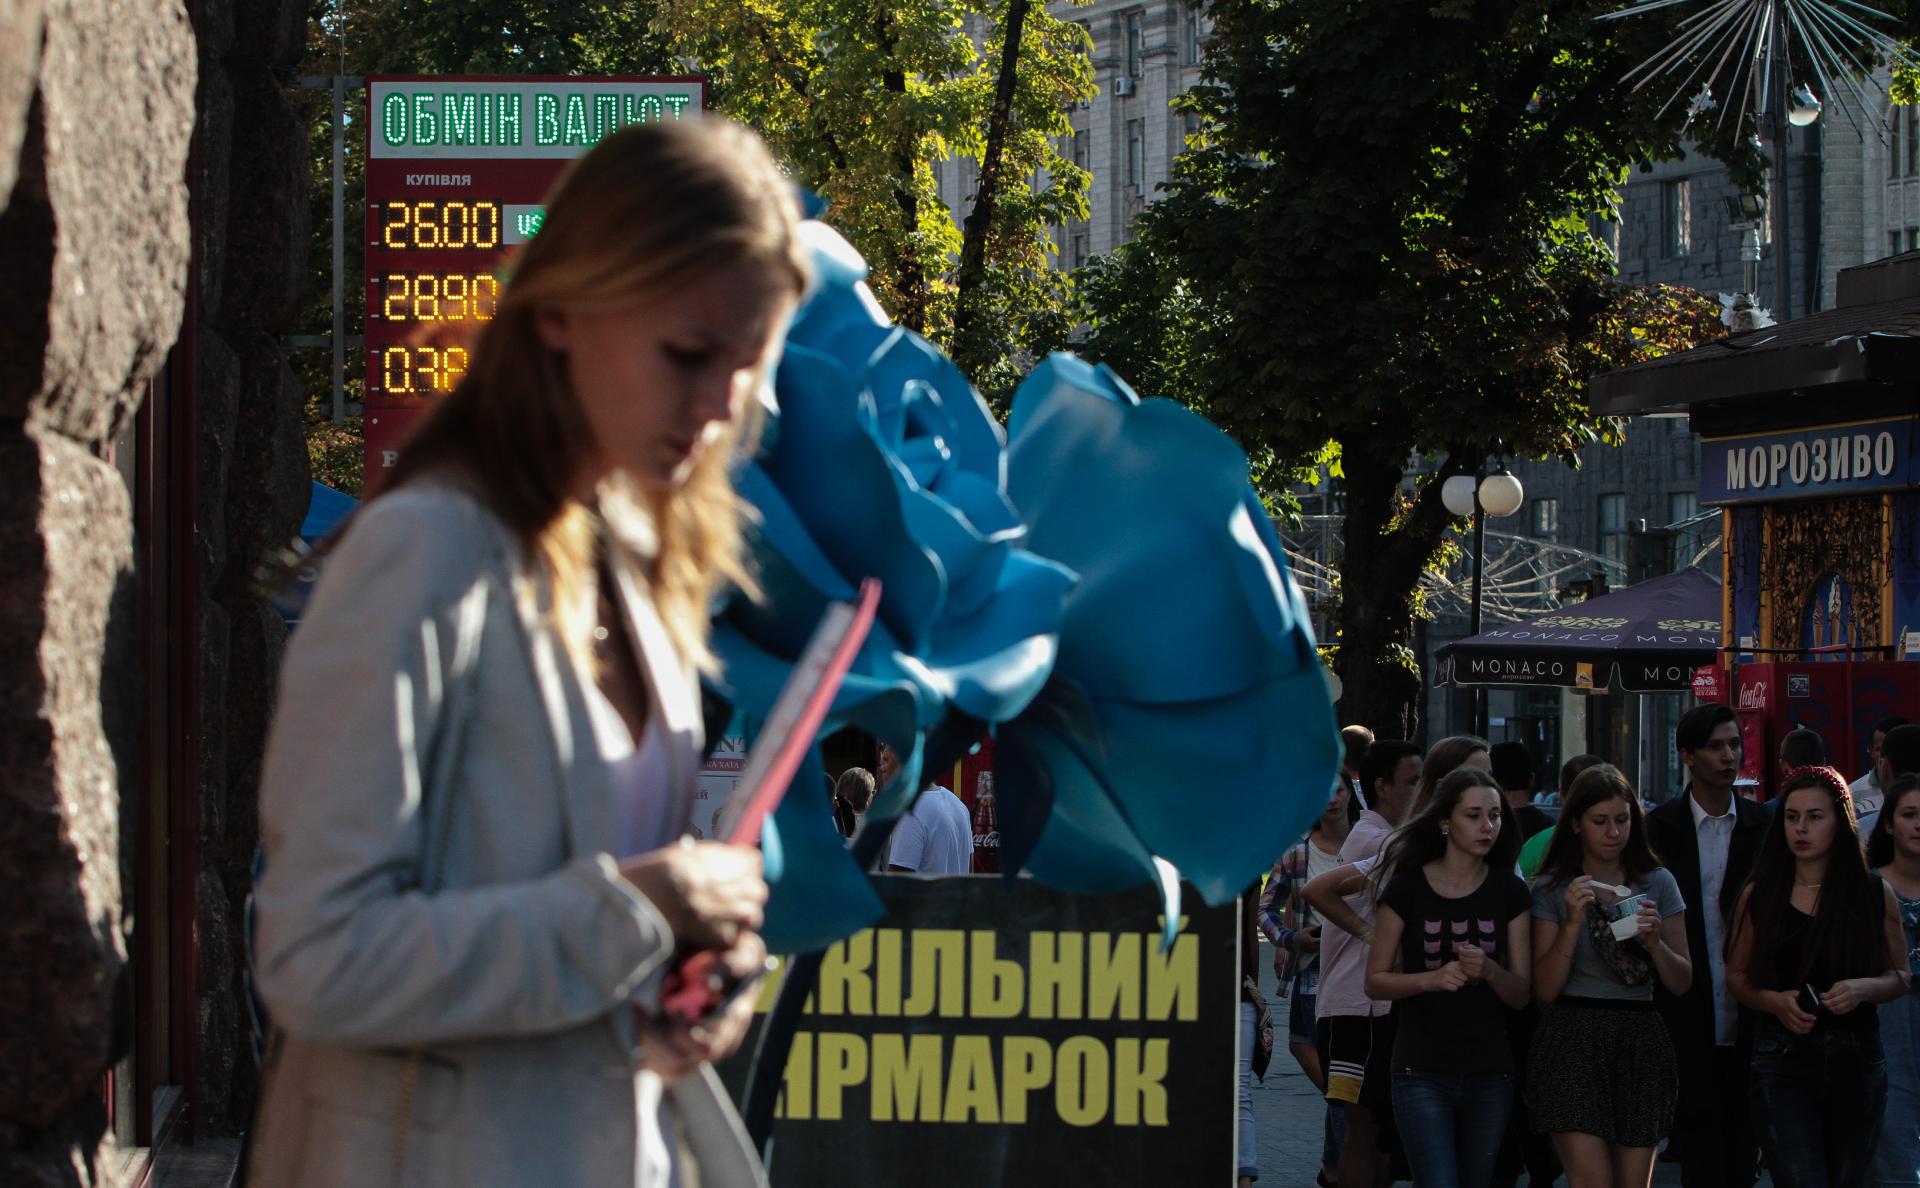 Фото: Сергей Харченко / Zuma / ТАСС